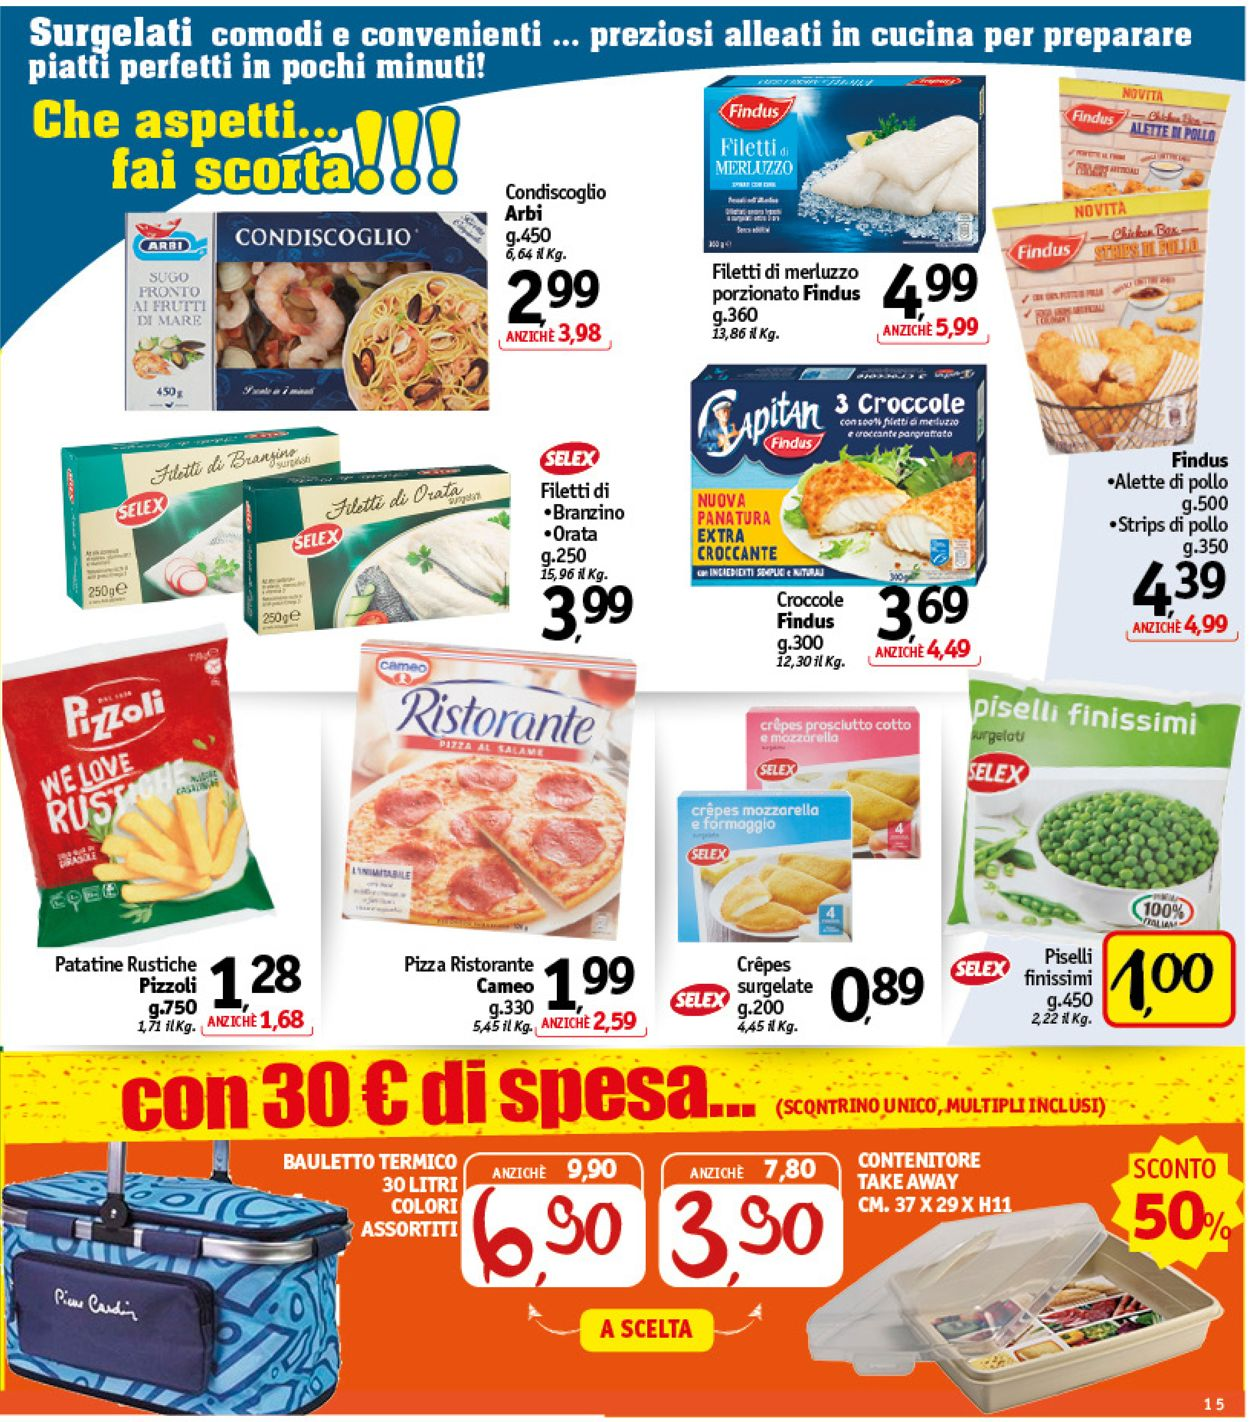 Volantino Famila - Offerte 06/05-15/05/2021 (Pagina 15)